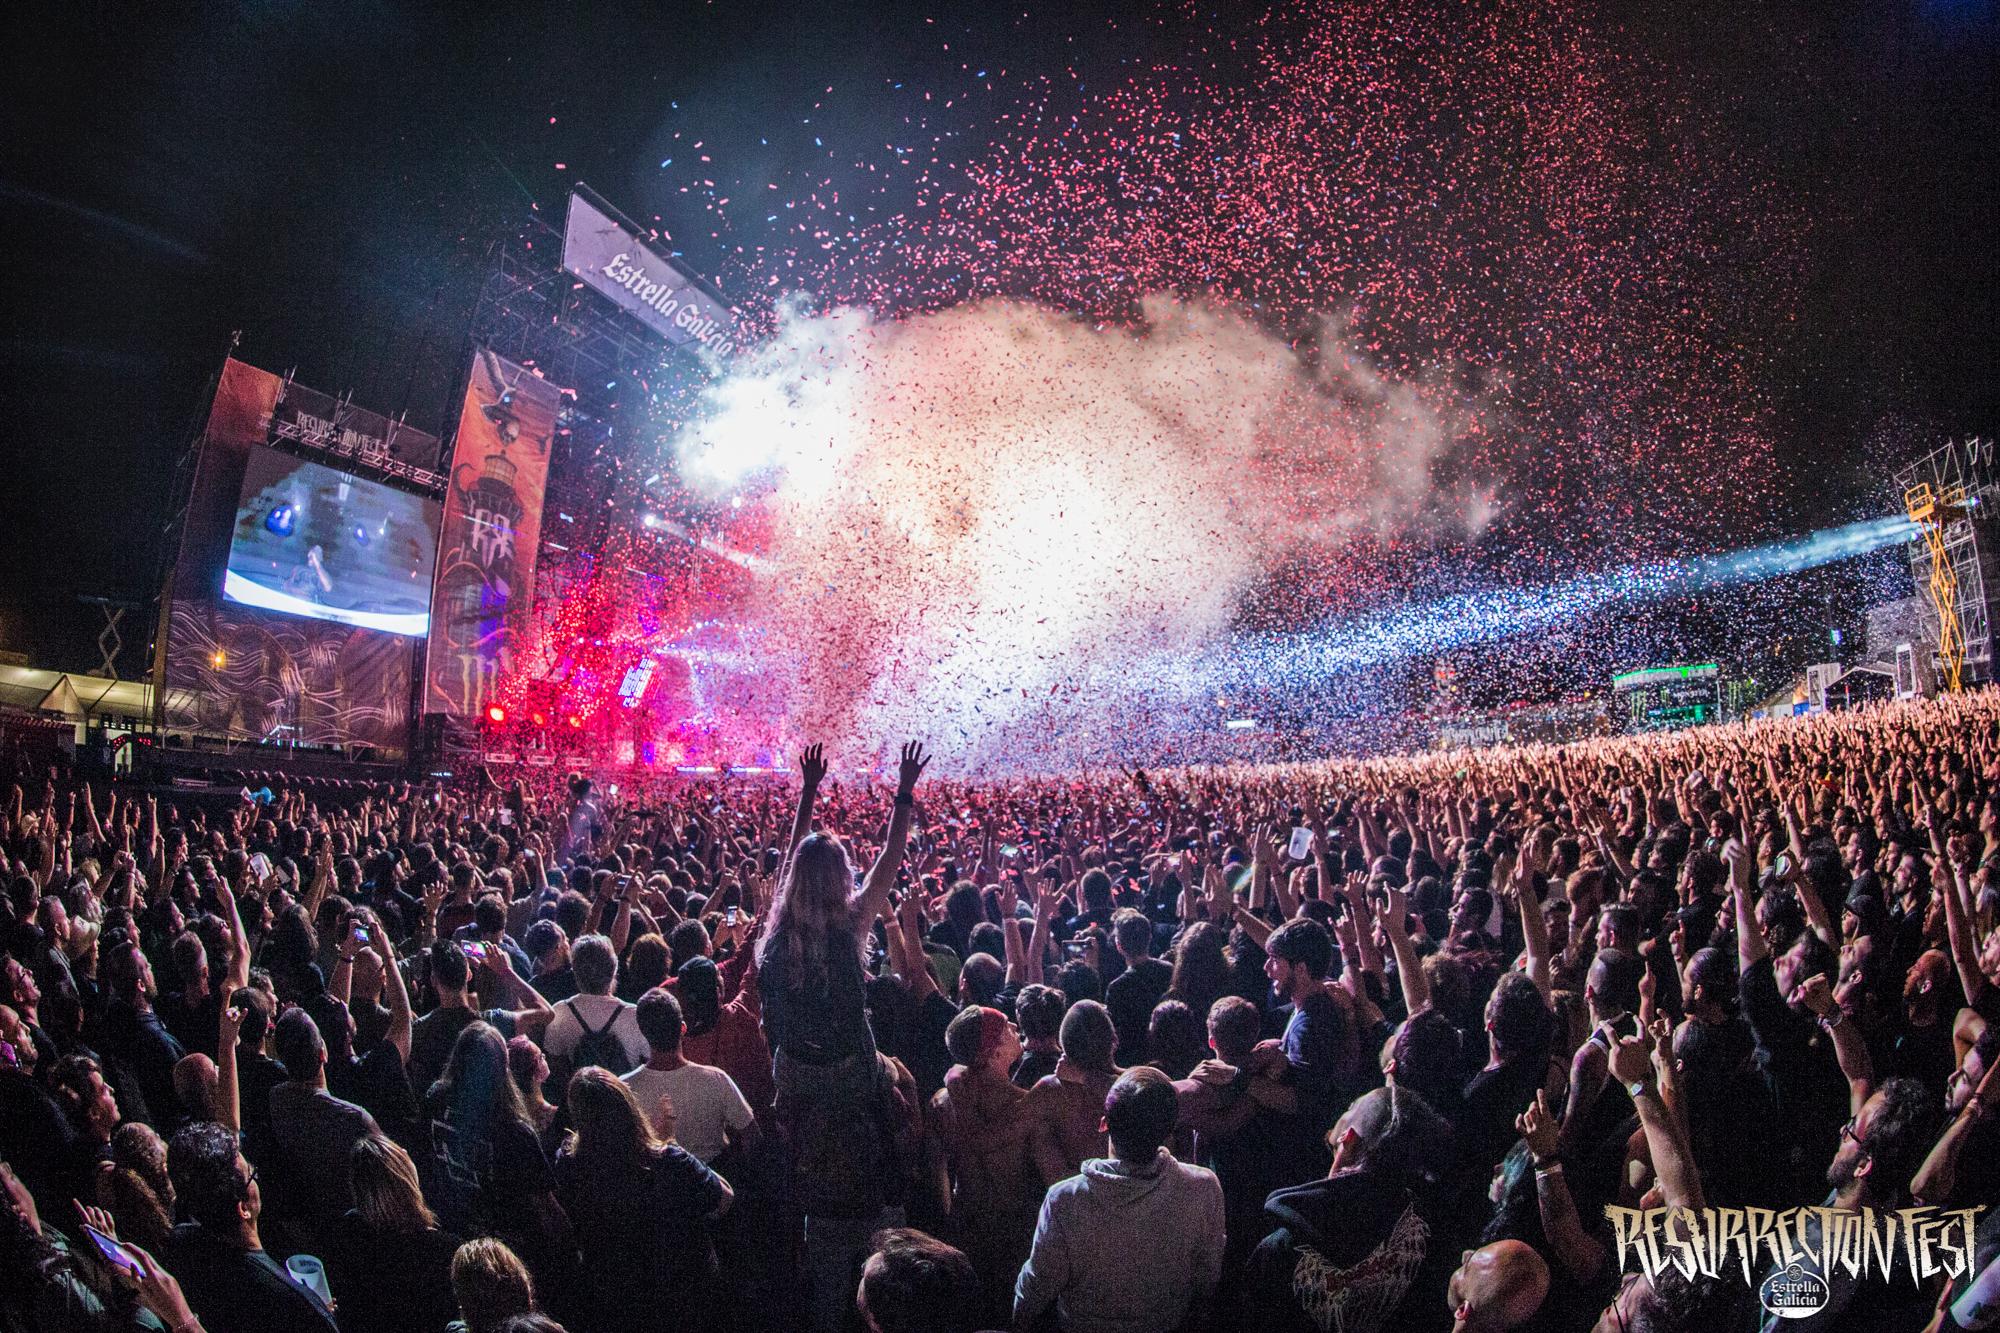 Resurrection Fest 2017 - Rammstein - Amerika Confetti - Javier Bragado